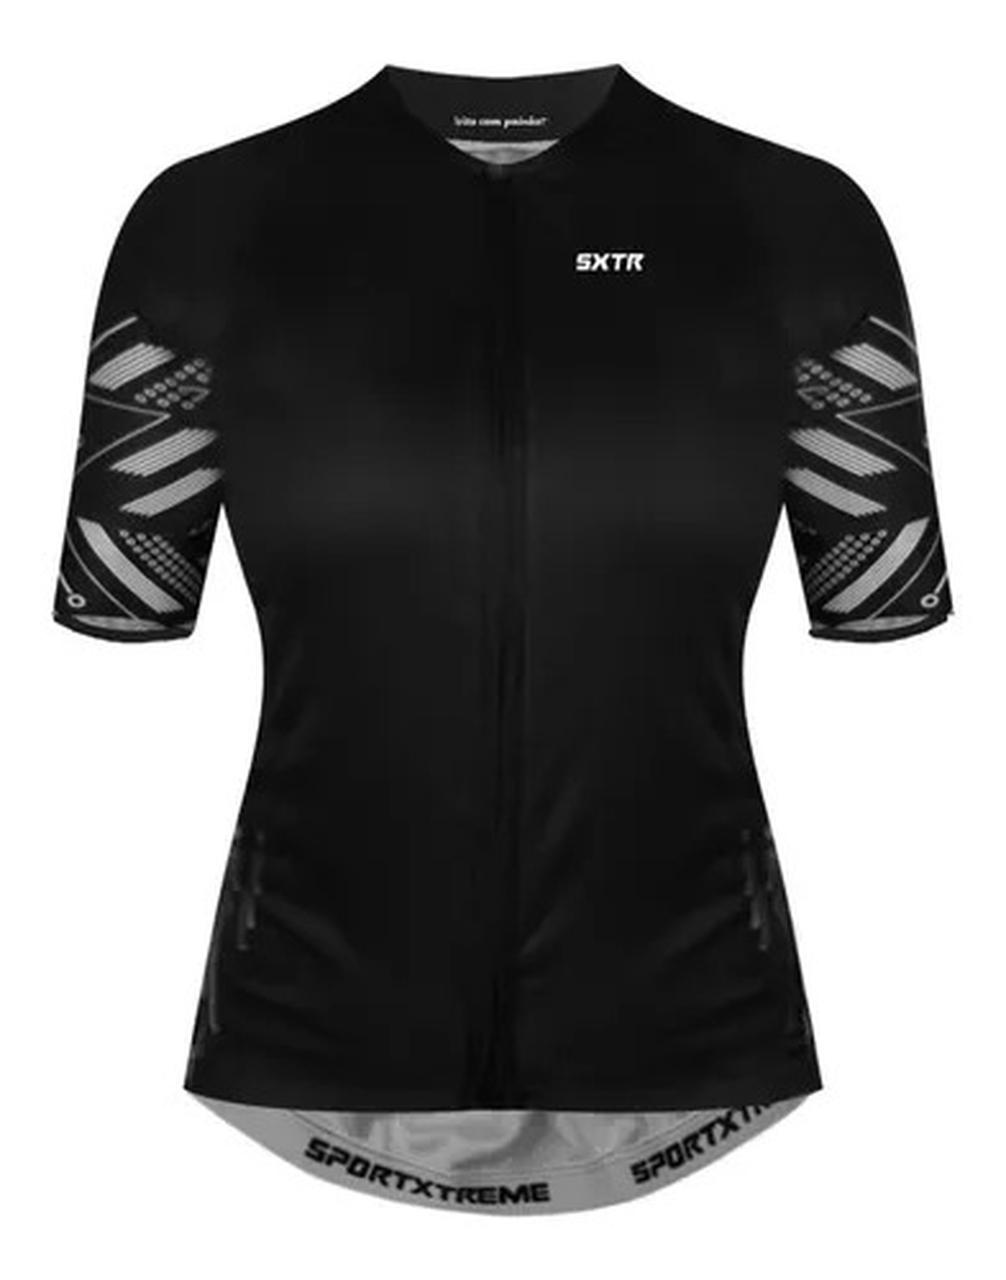 Camisa Ciclismo Feminina Move - SportXtreme